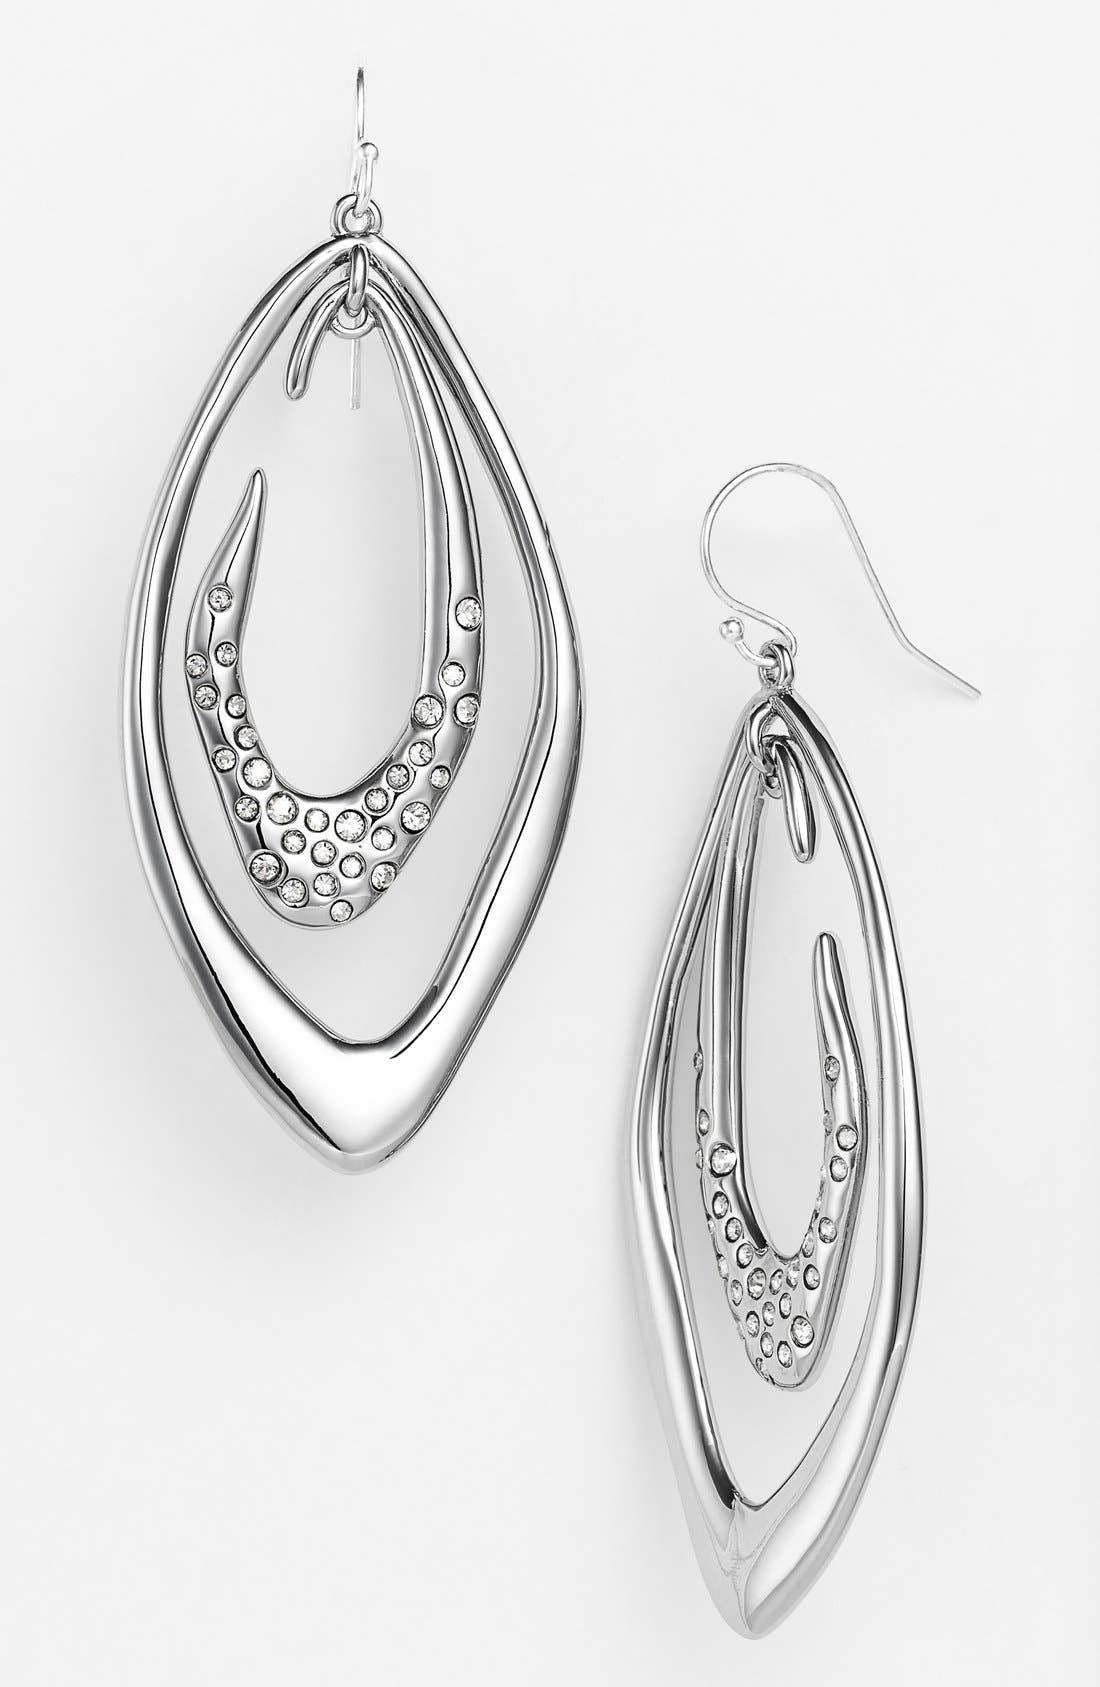 Main Image - Alexis Bittar 'Miss Havisham - Liquid' Orbiting Drop Earrings